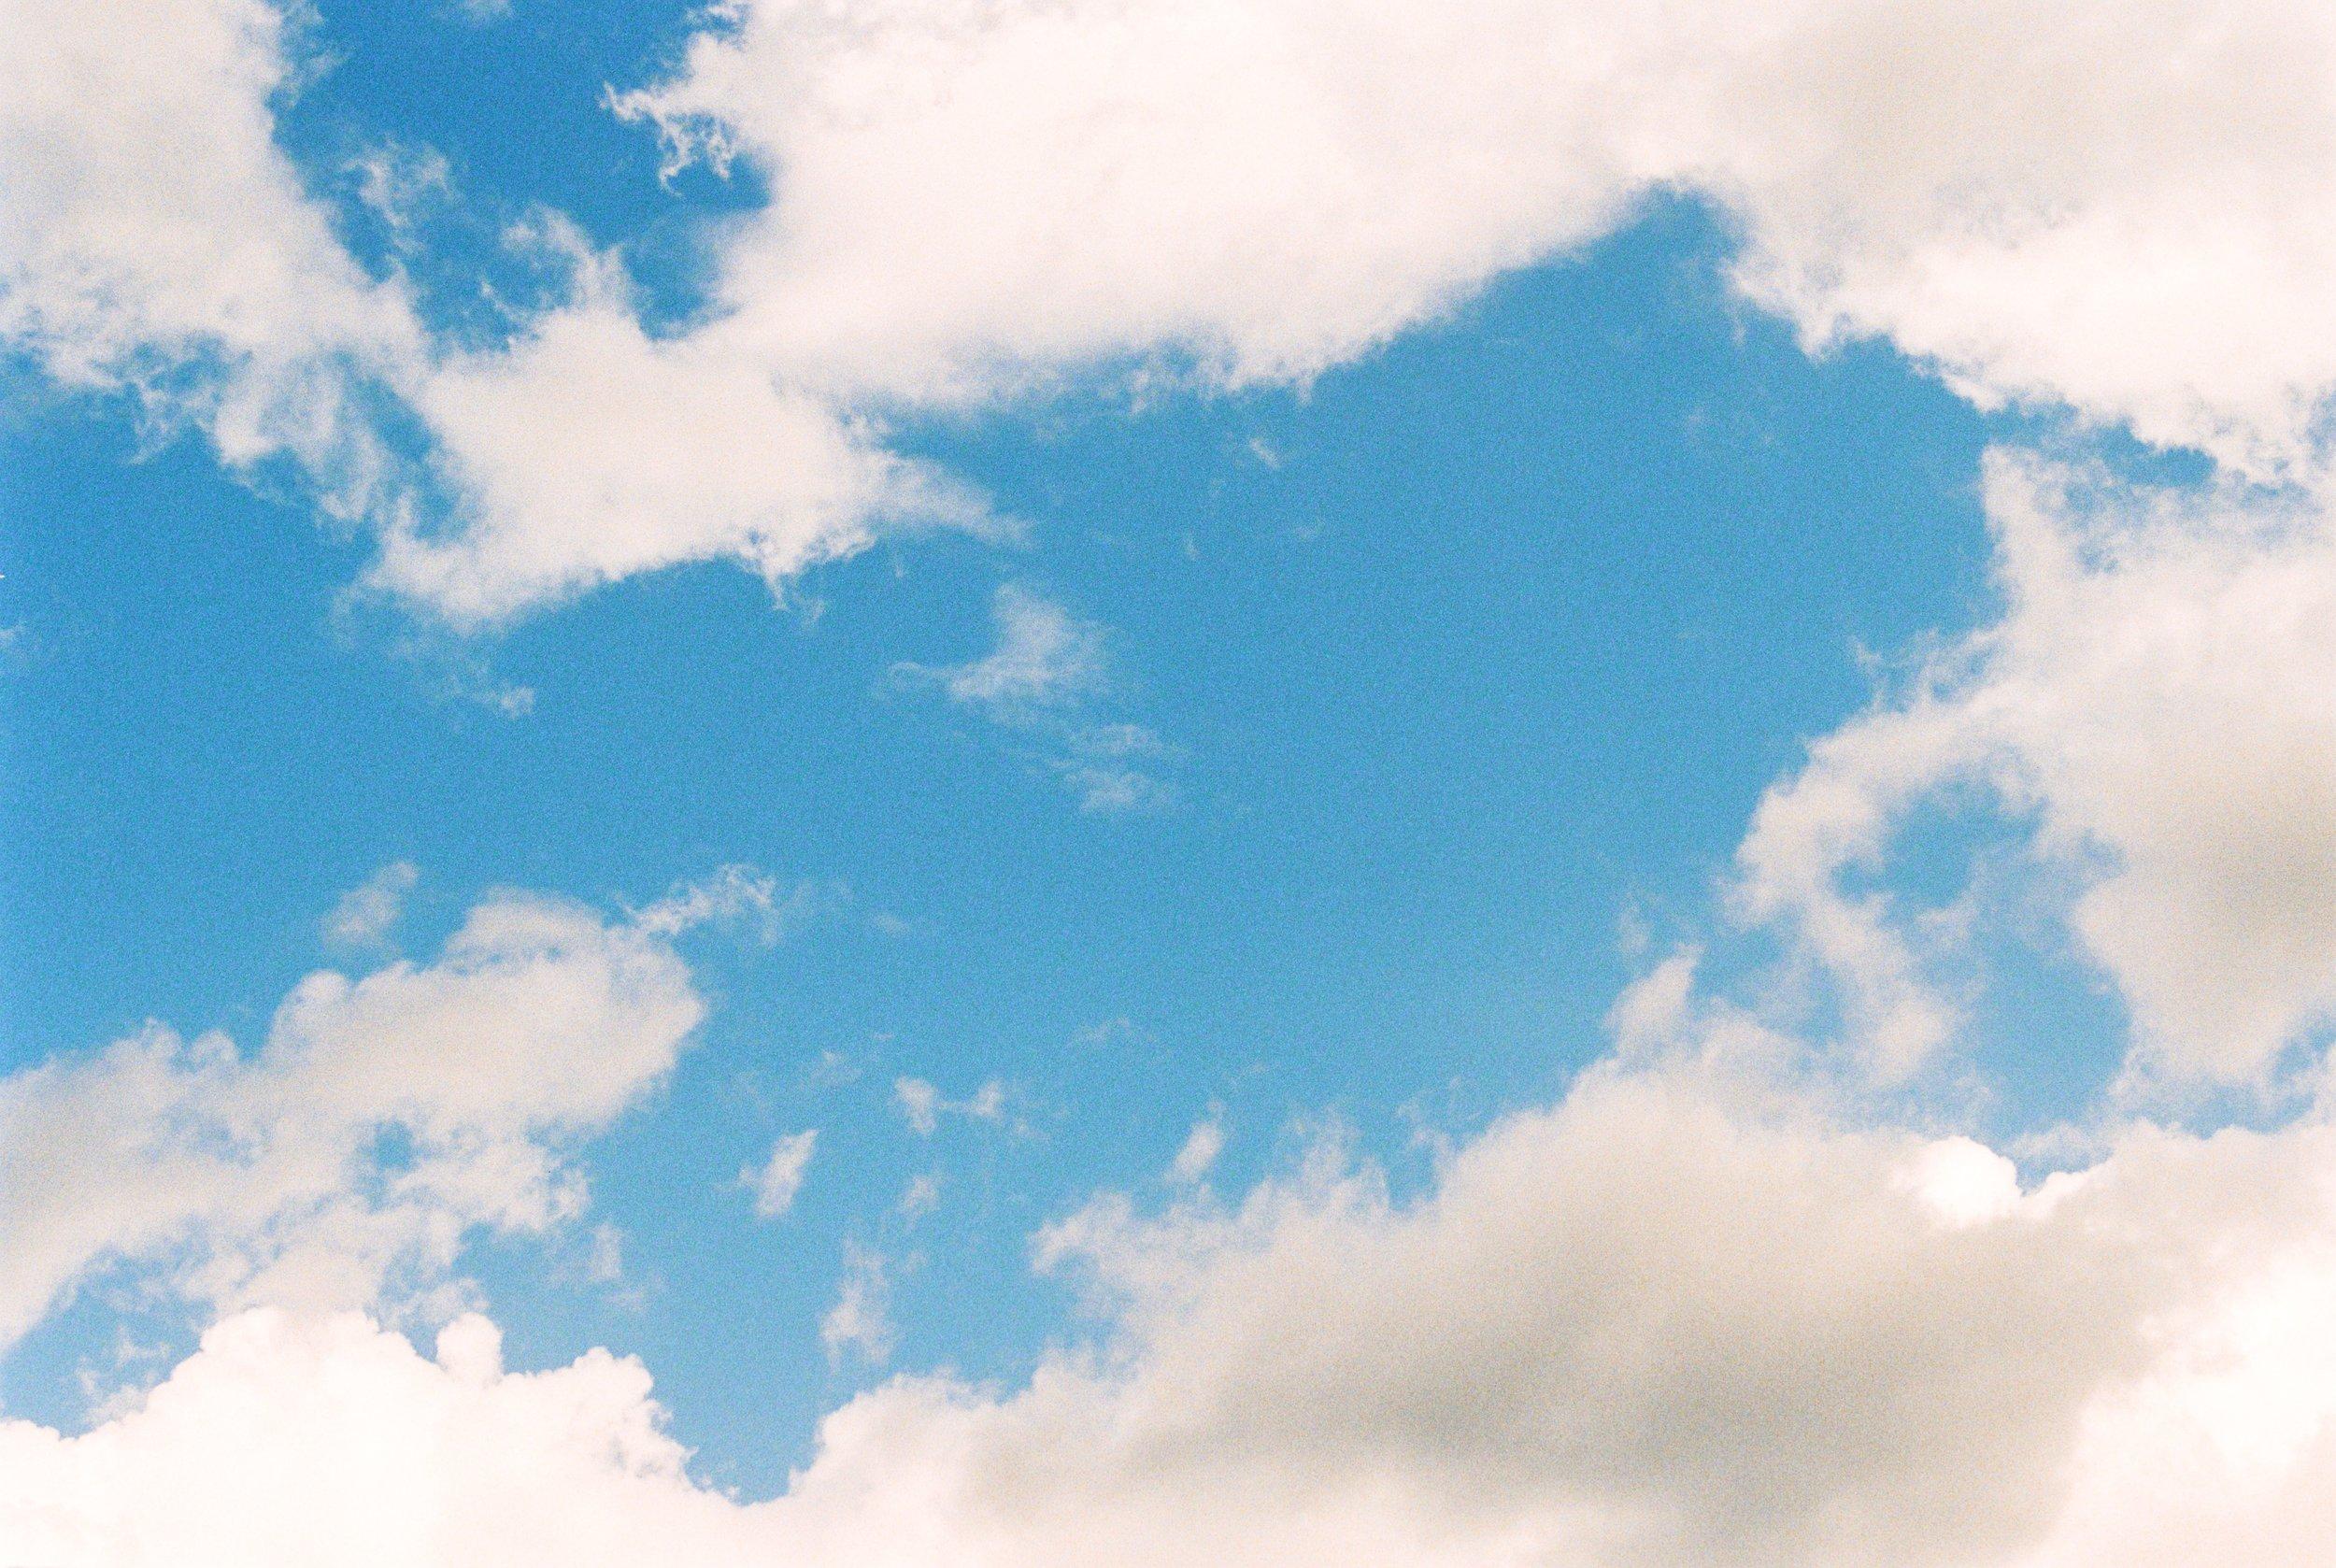 clouds_cloud_film_photographer_emily_walker_16.jpg